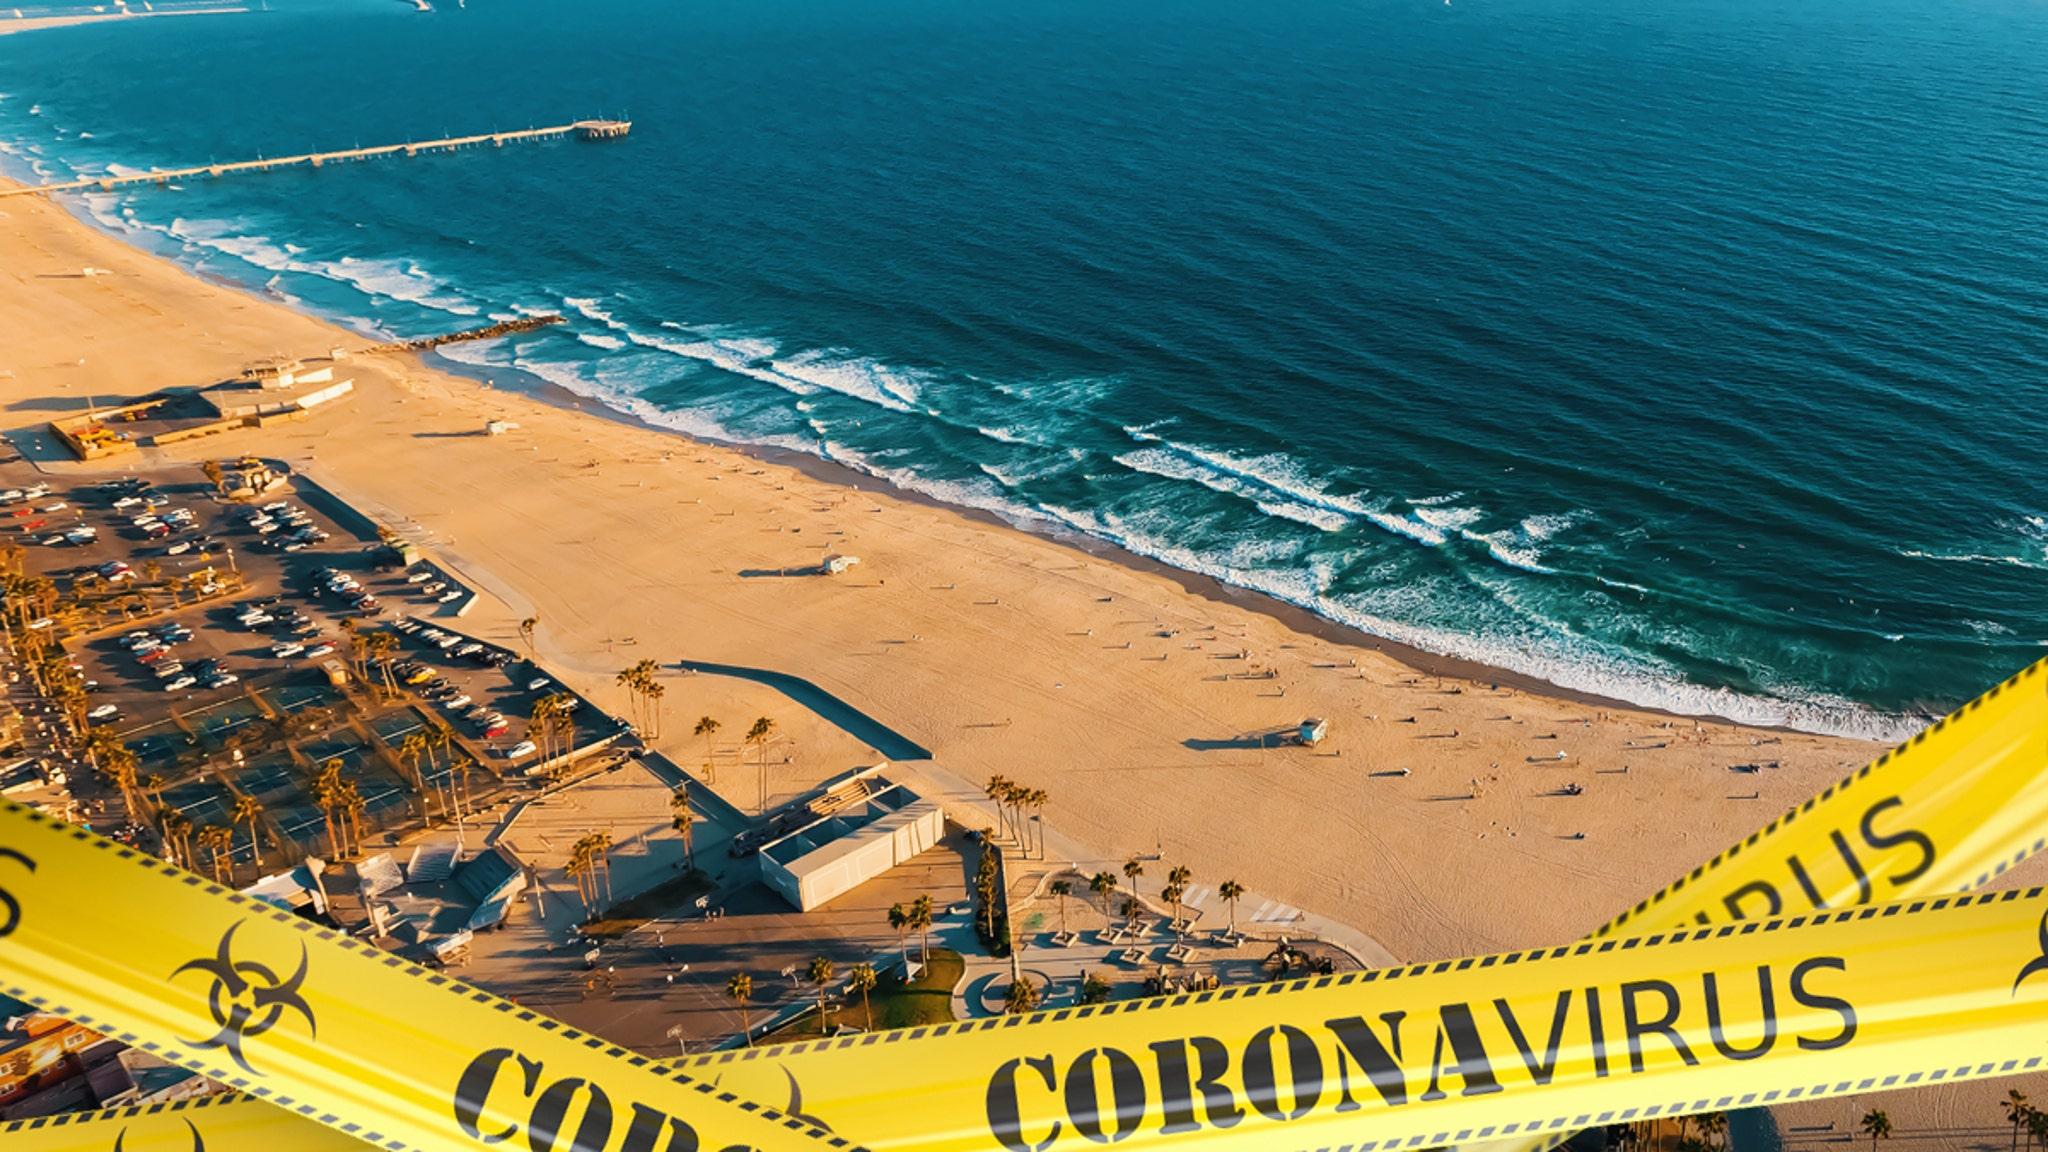 Coronavirus Risk High in Ocean and at Beaches, Scientist Warns